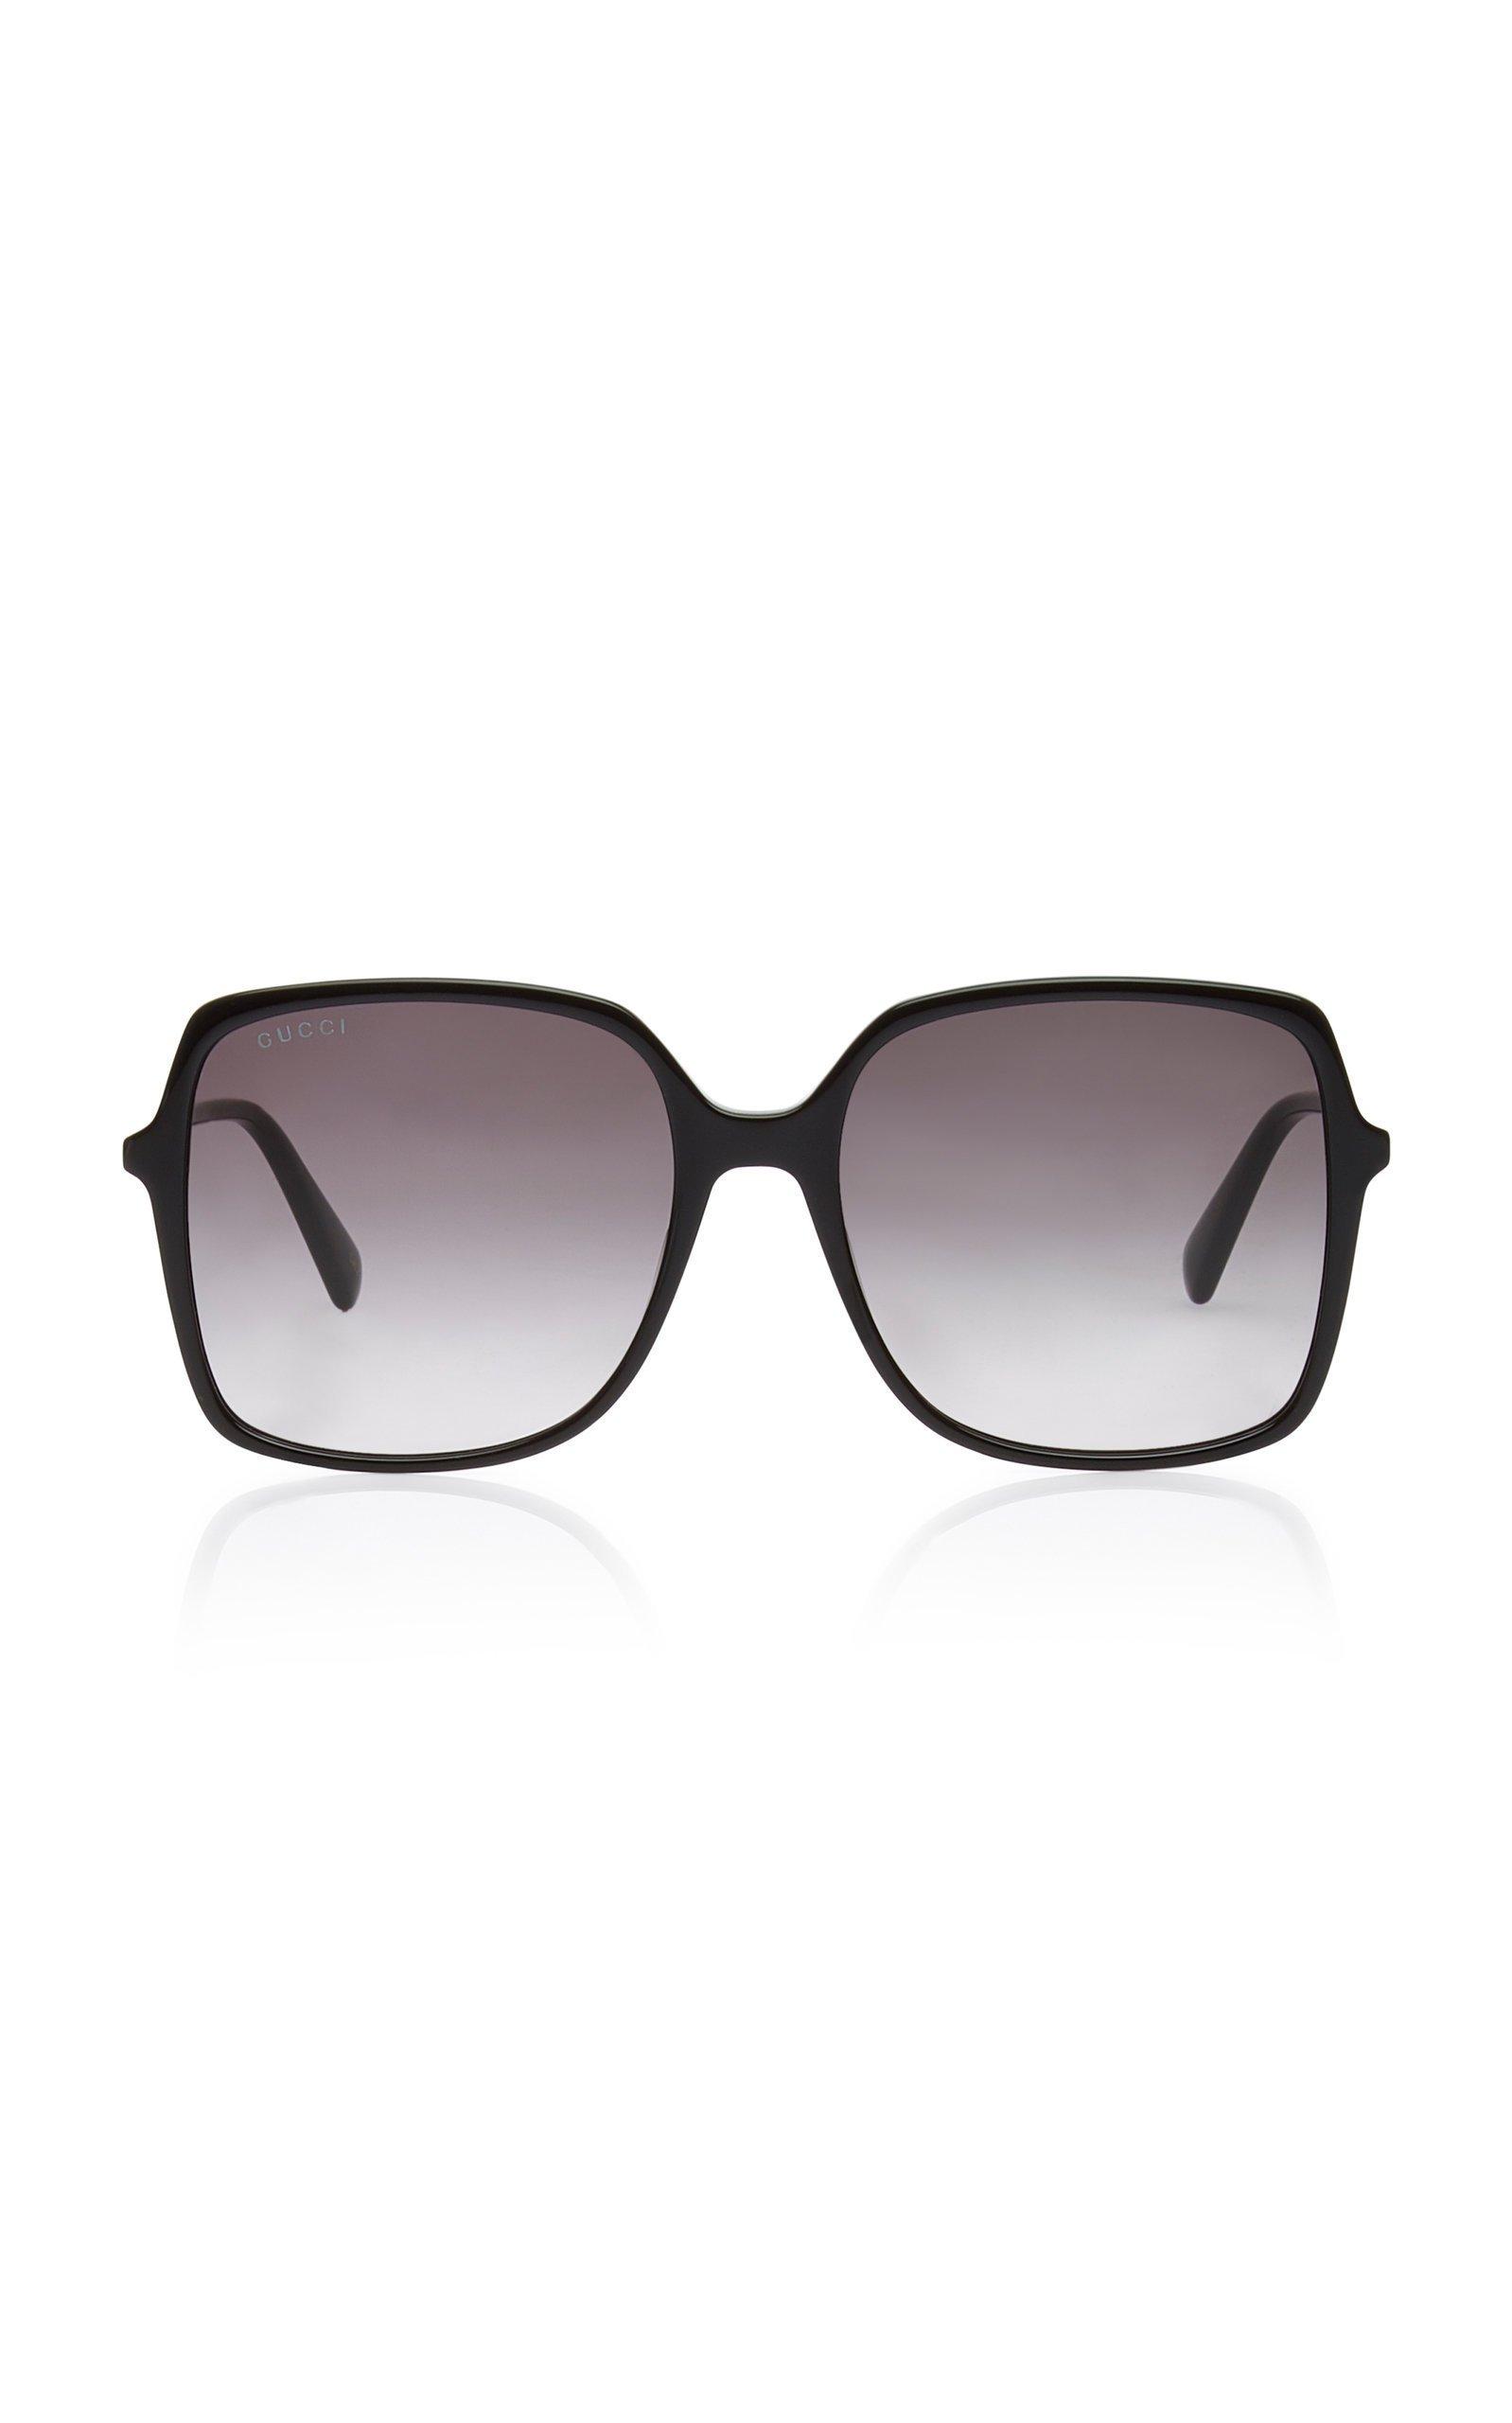 Gucci Ultralight Acetate Square-Frame Sunglasses